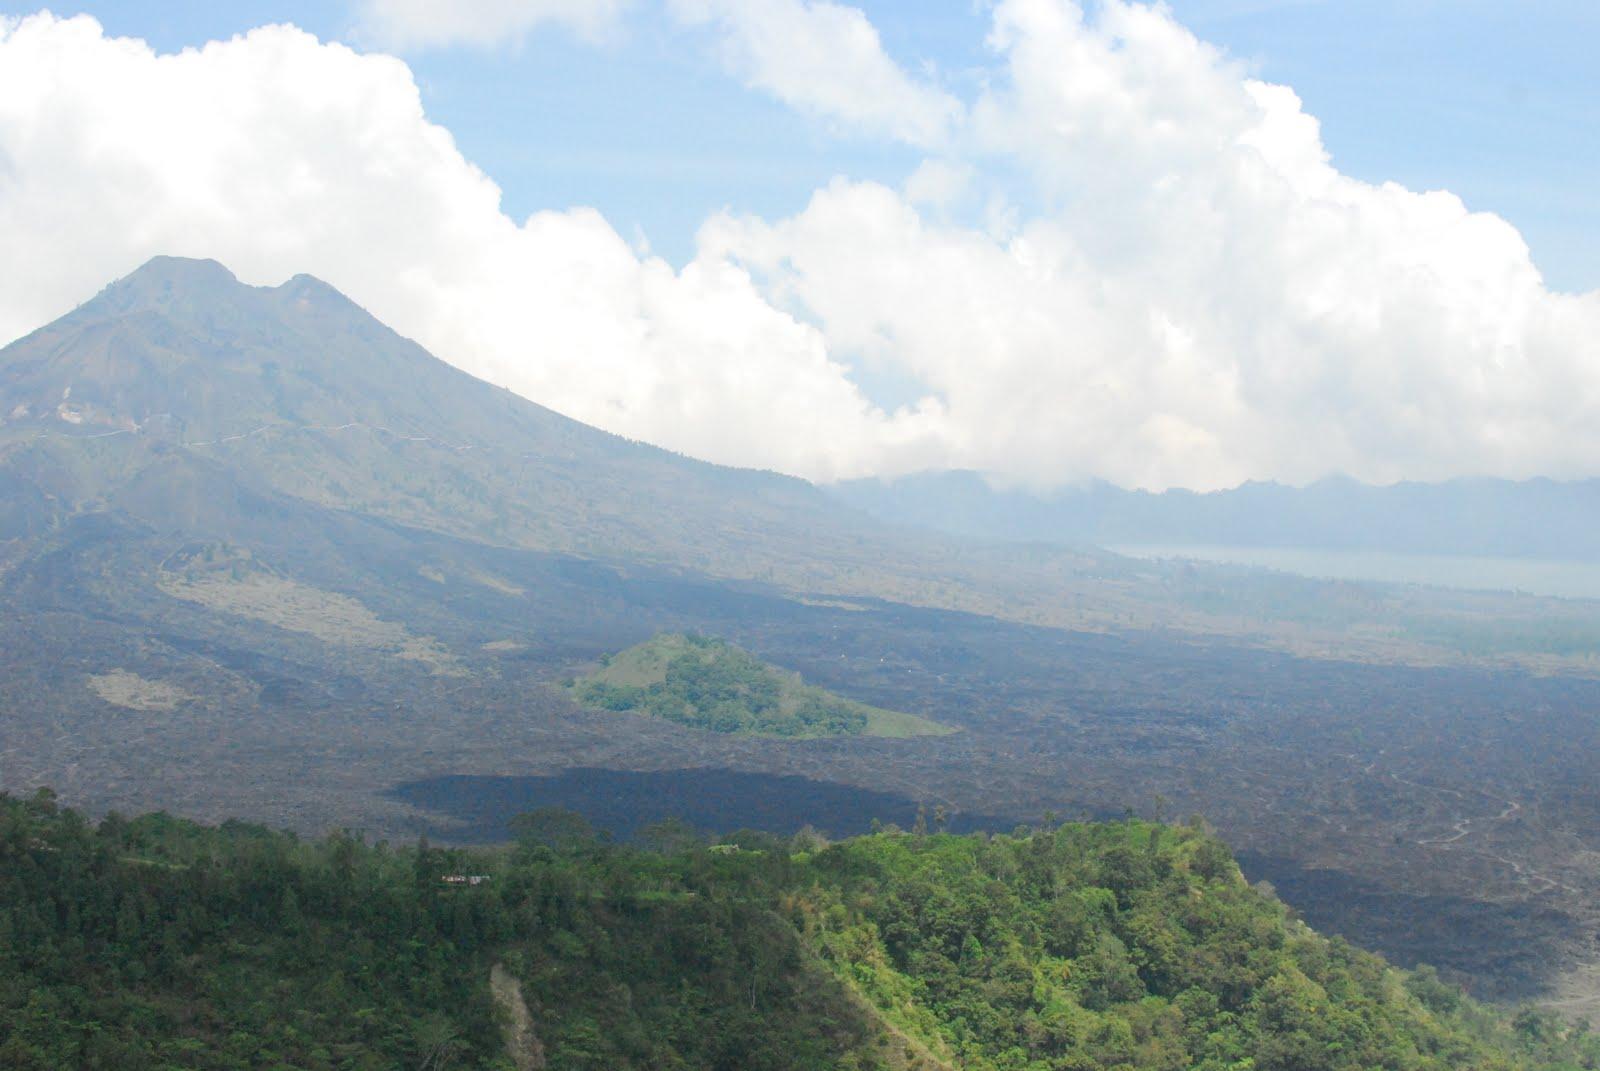 bali volcano - photo #25